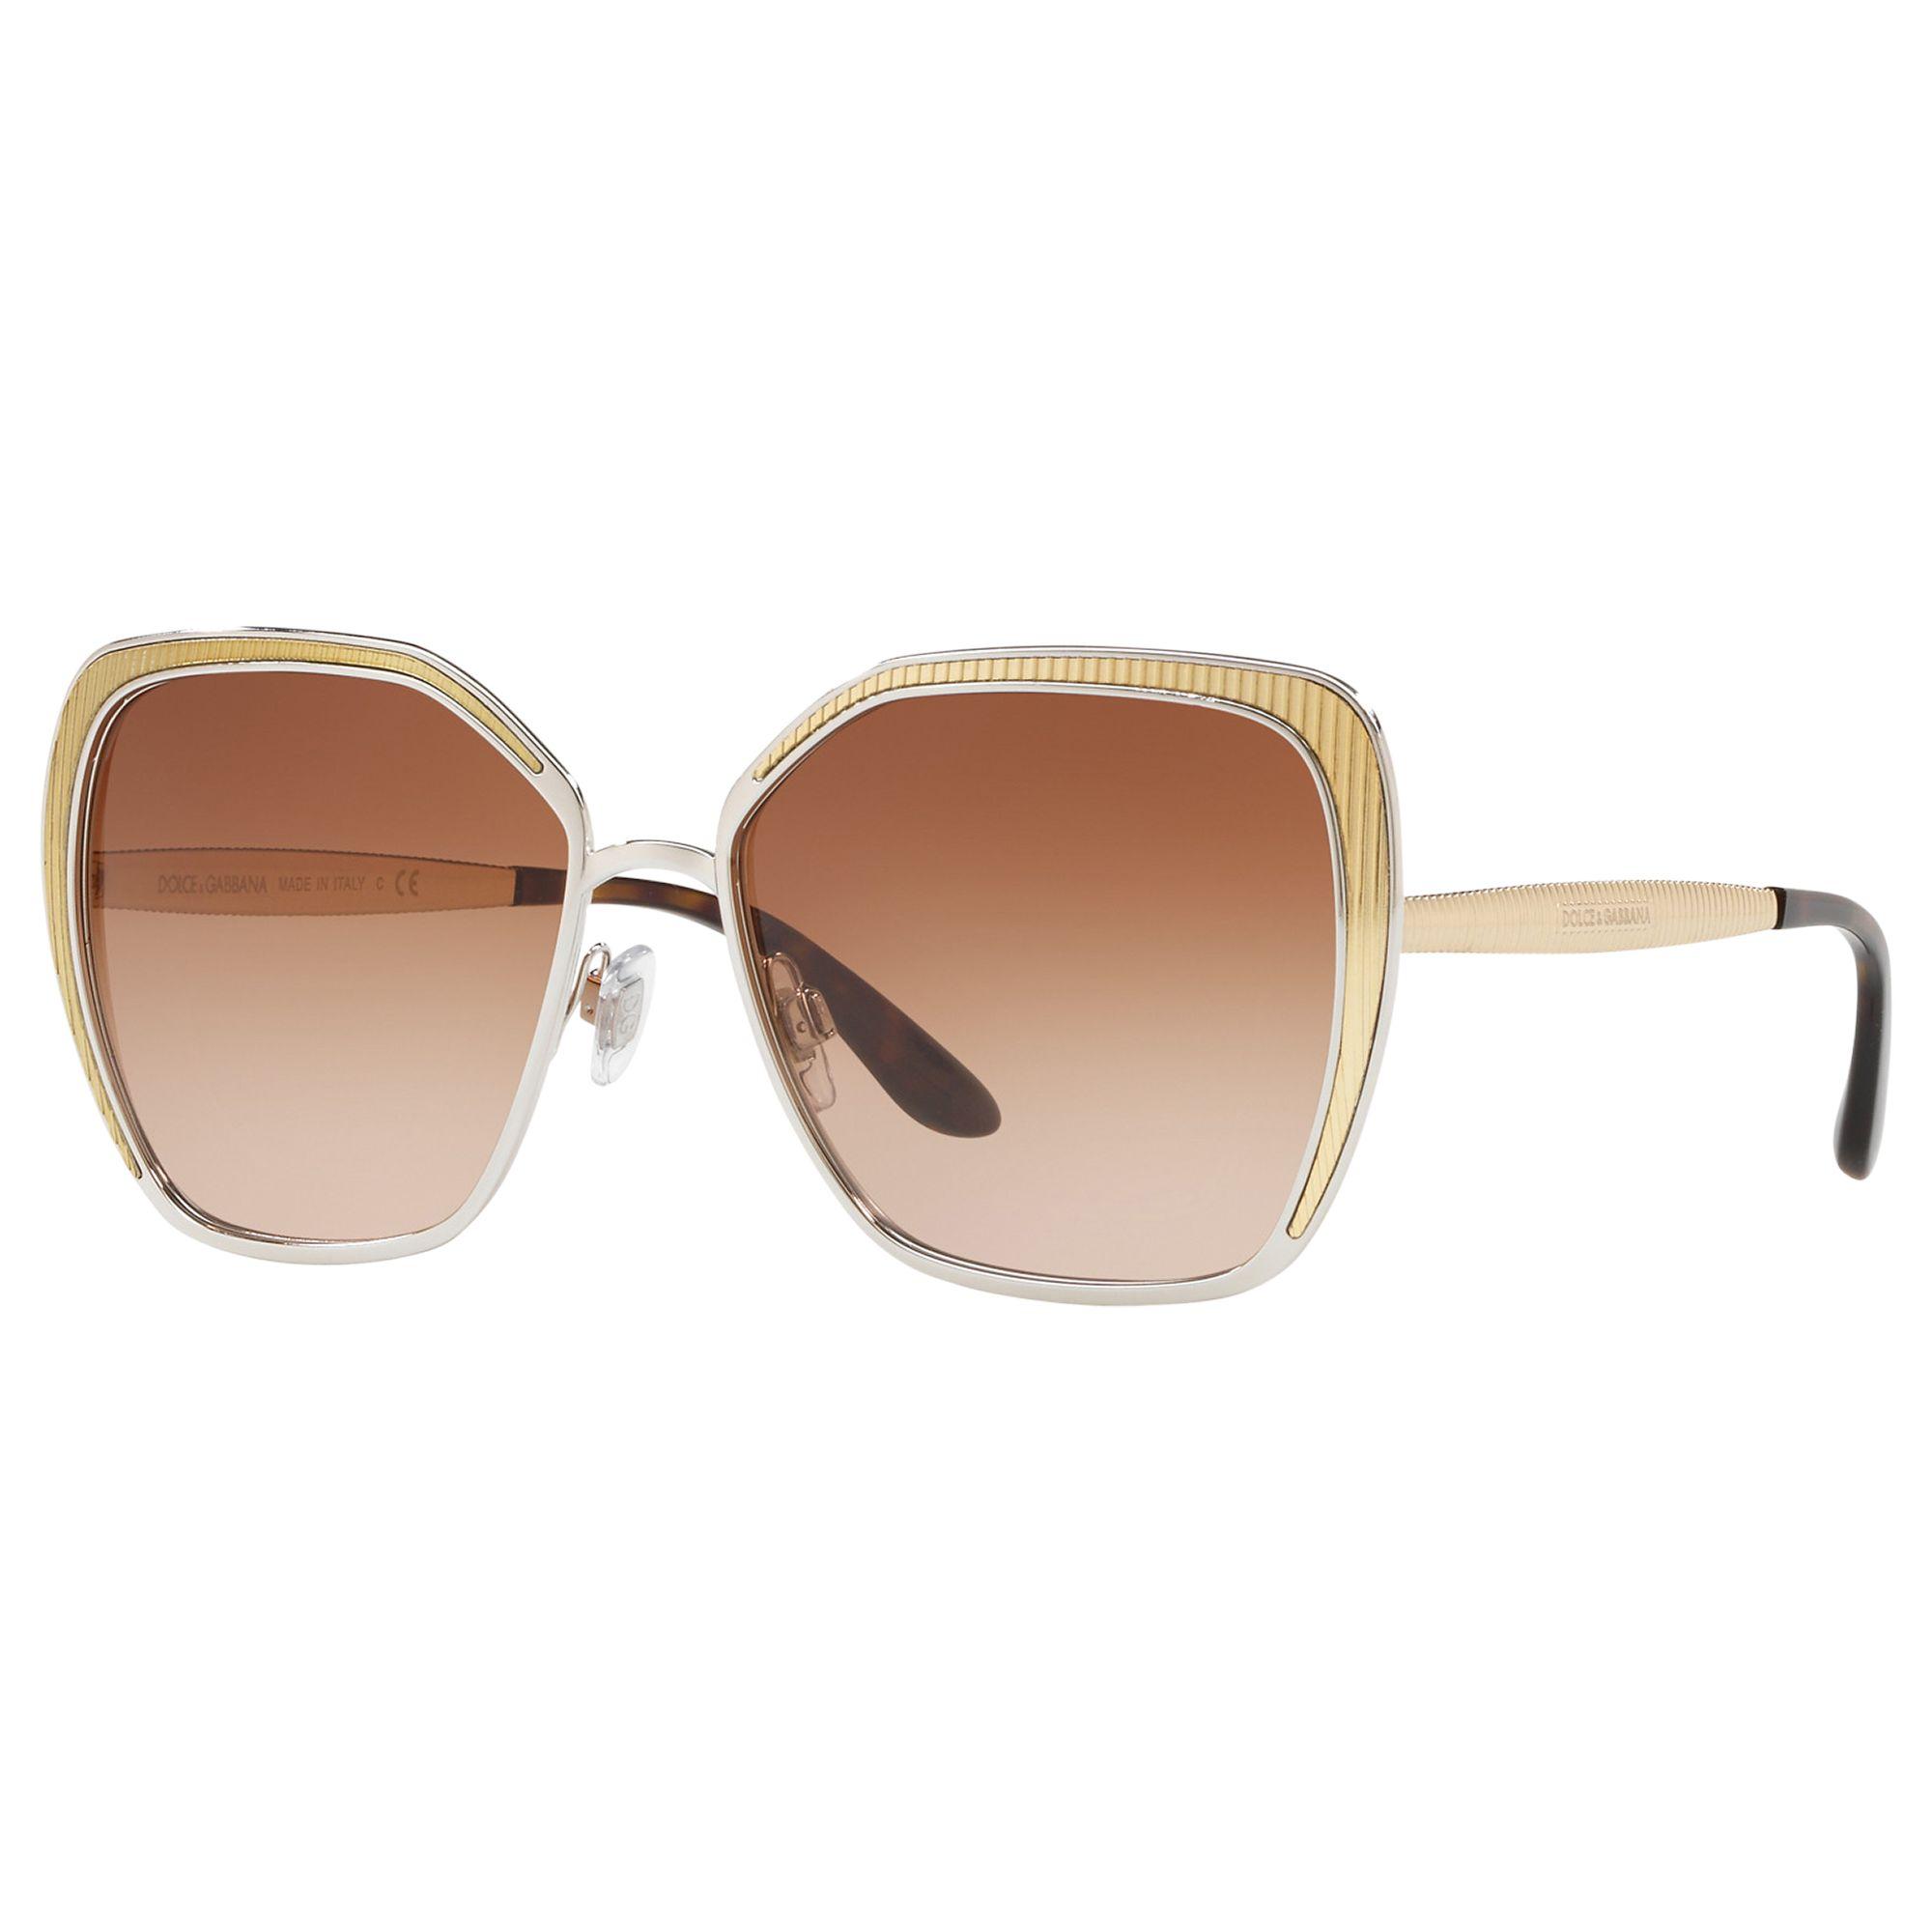 Dolce & Gabbana Dolce & Gabbana DG2197 Women's Geometric Sunglasses